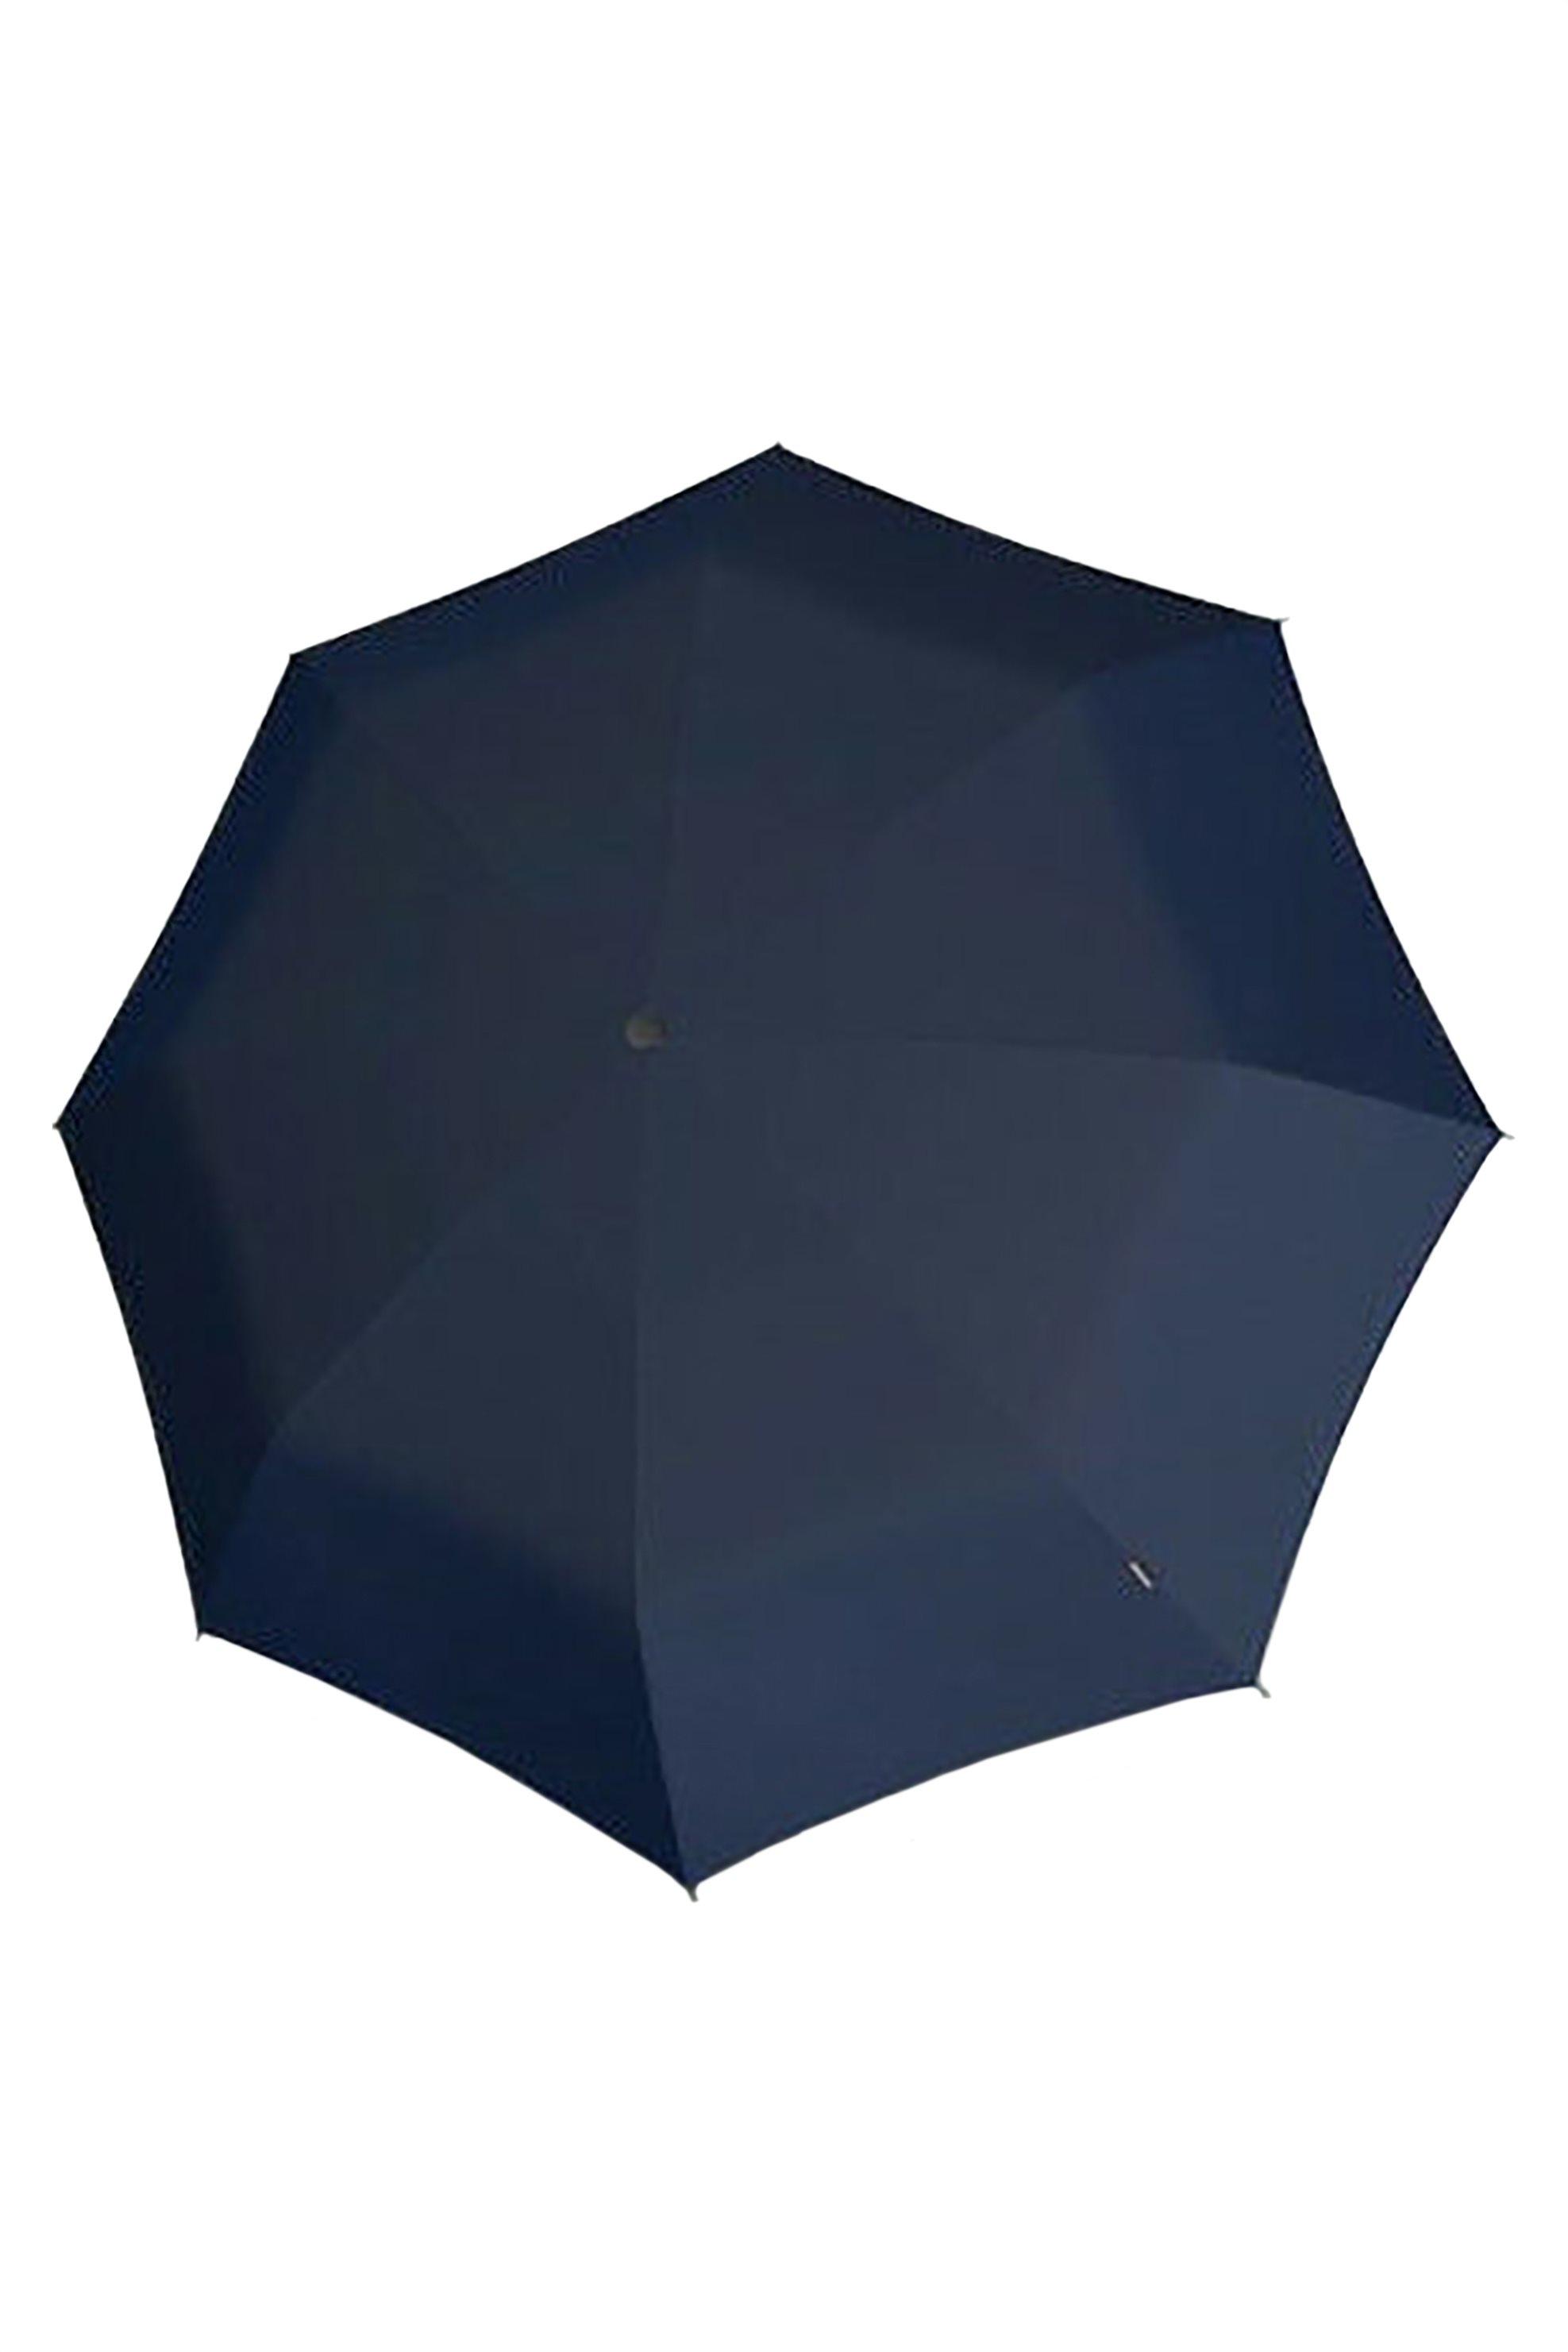 Knirps πτυσσόμενη ομπρέλα με χειροκίνητο μηχανισμό - KNUM70101200 - Μπλε Σκούρο